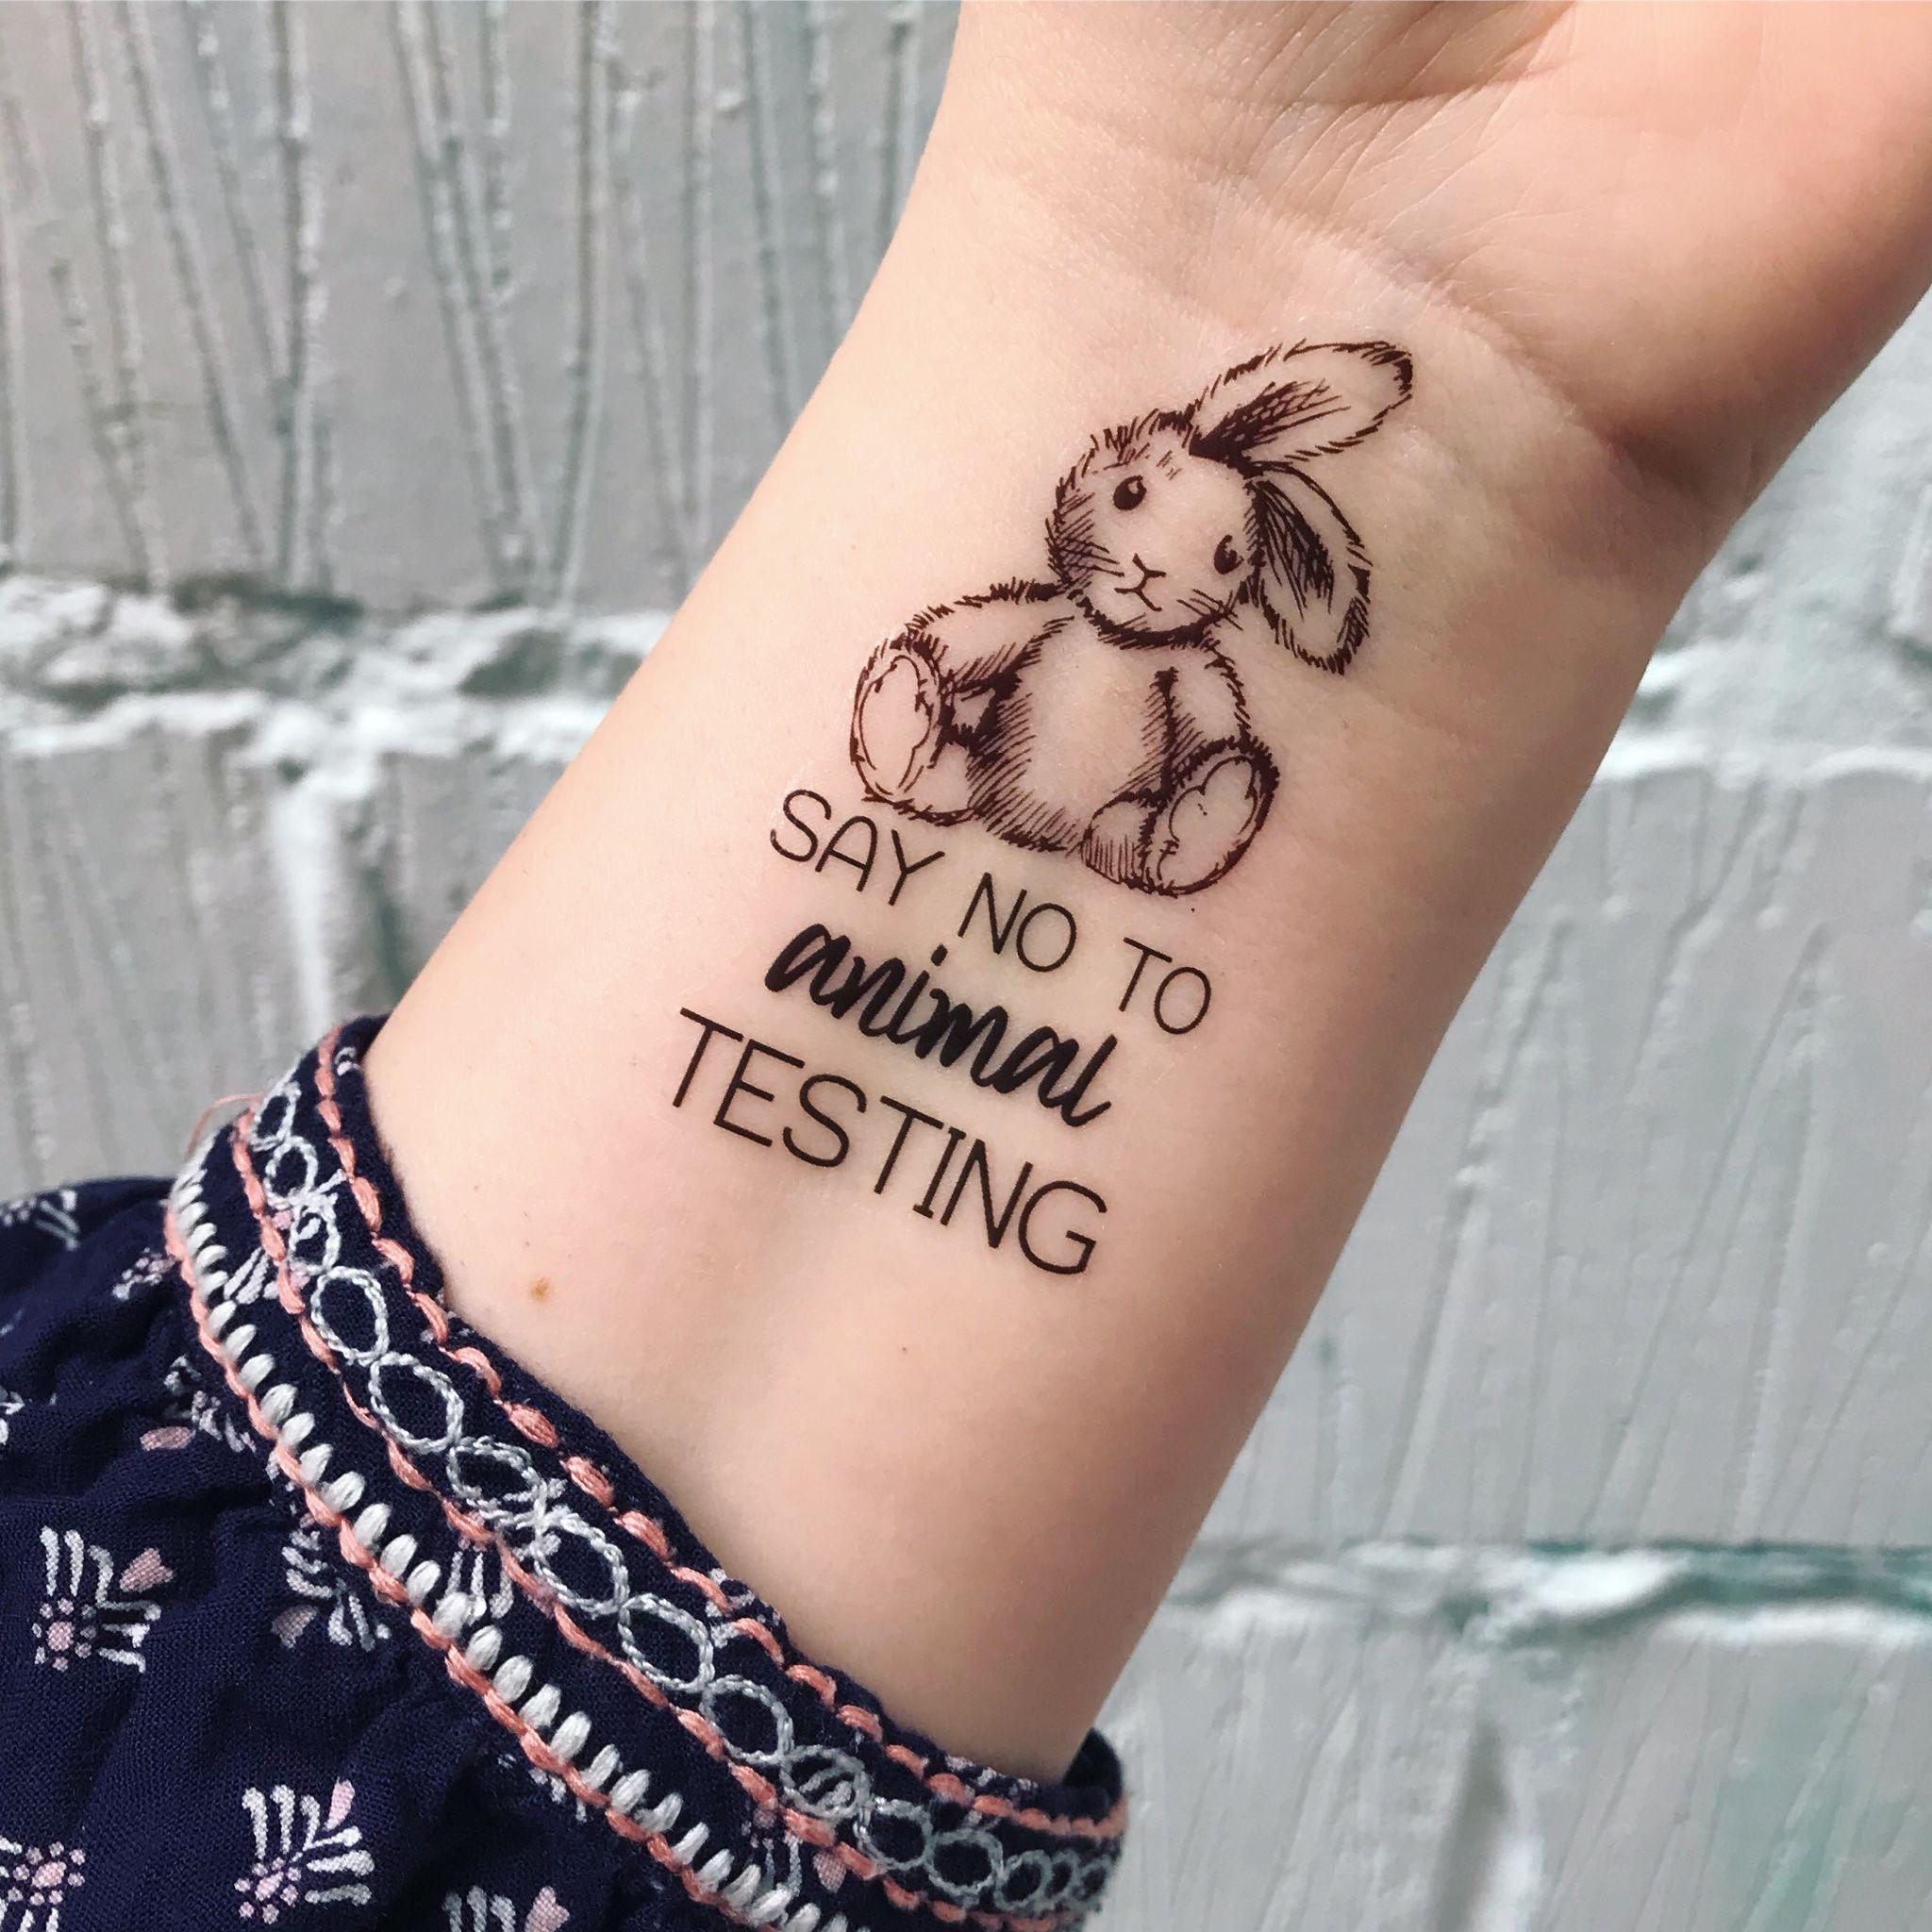 Vegan Love Temporary Tattoo Set Vegan Tattoo Vegan Temporary Tattoos Vegan Gift Vegan Gift Idea